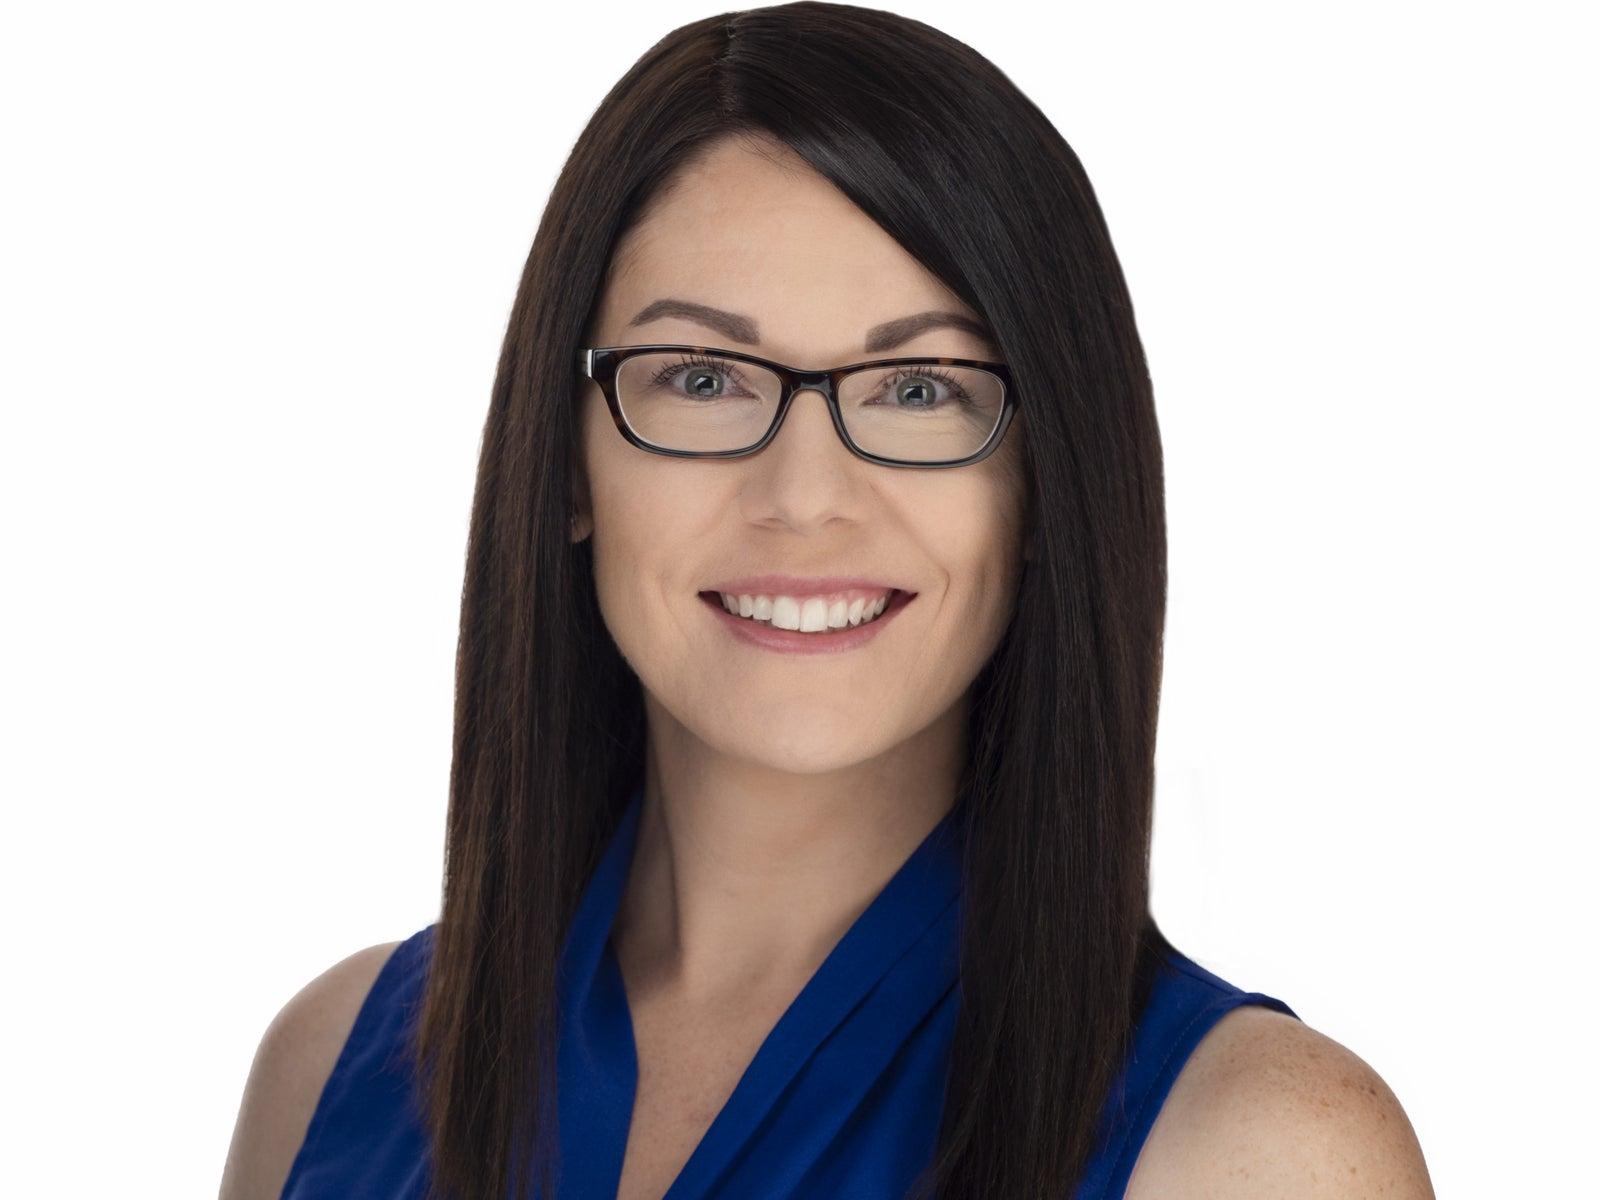 Roxann Klepper is a Licensed Real Estate Agent in Red Deer Alberta